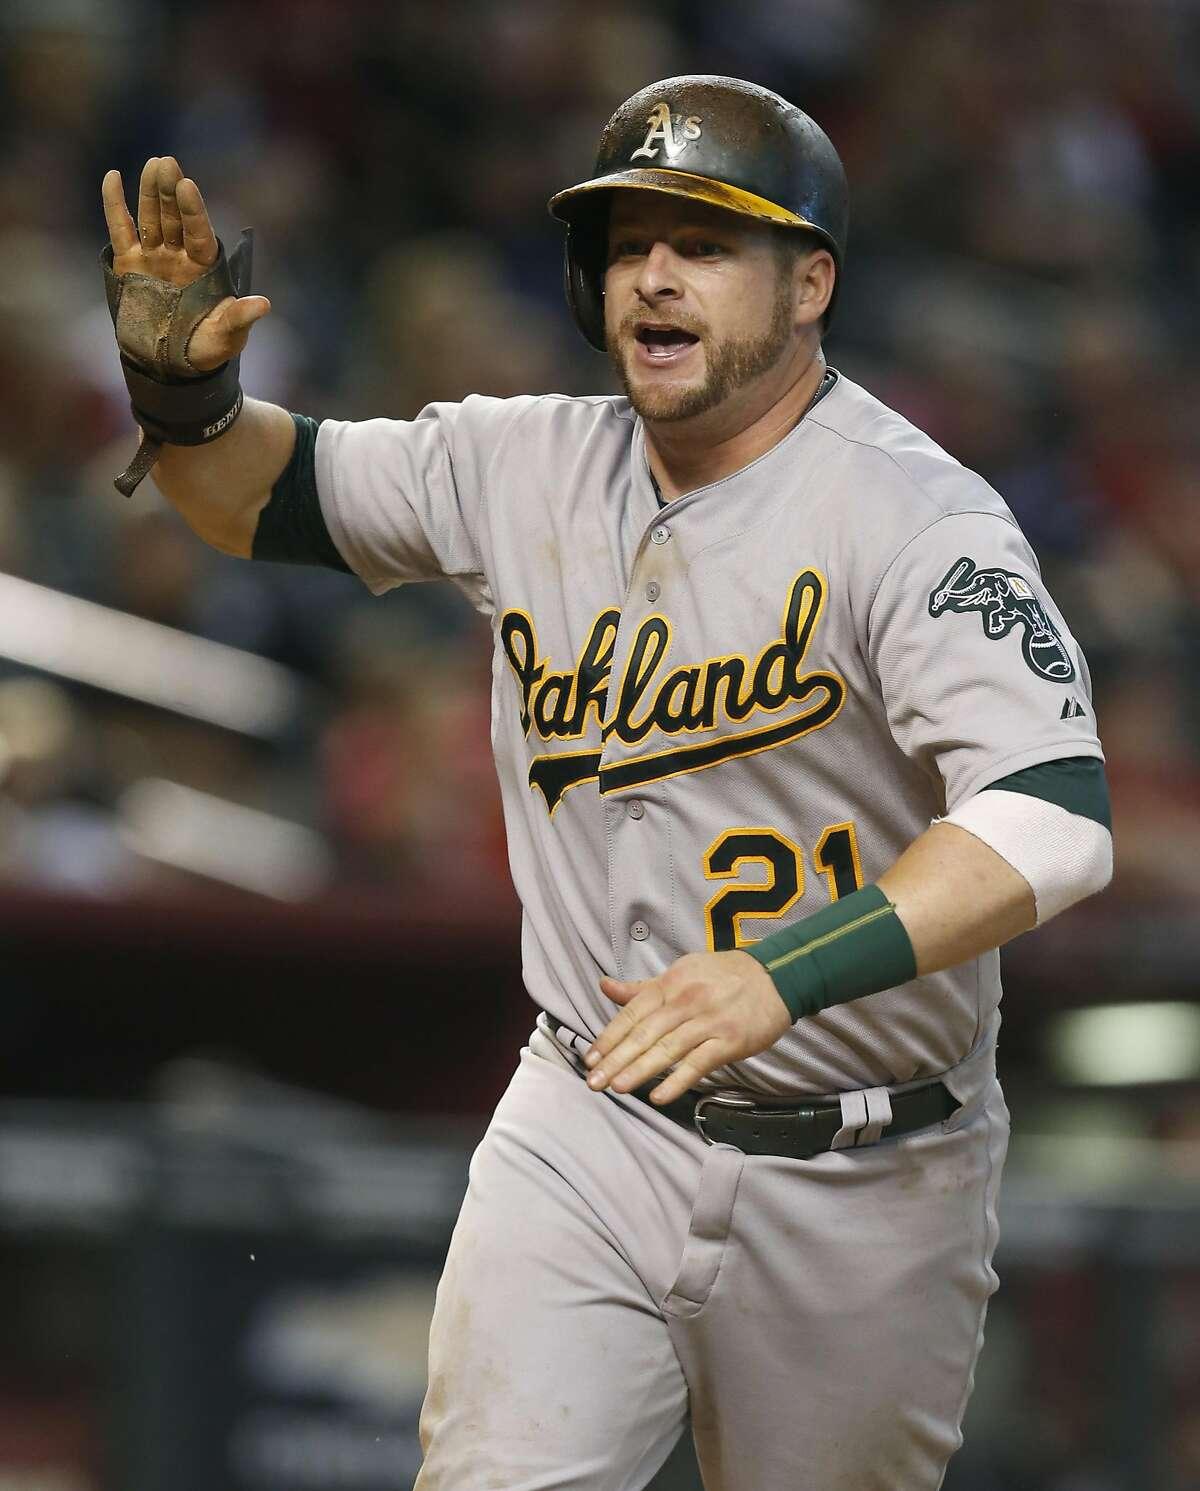 Oakland Athletics catcher Stephen Vogt (21) scores a run in the eleventh inning during a baseball game against the Arizona Diamondbacks, Sunday, Aug. 30, 2015, in Phoenix. (AP Photo/Rick Scuteri)